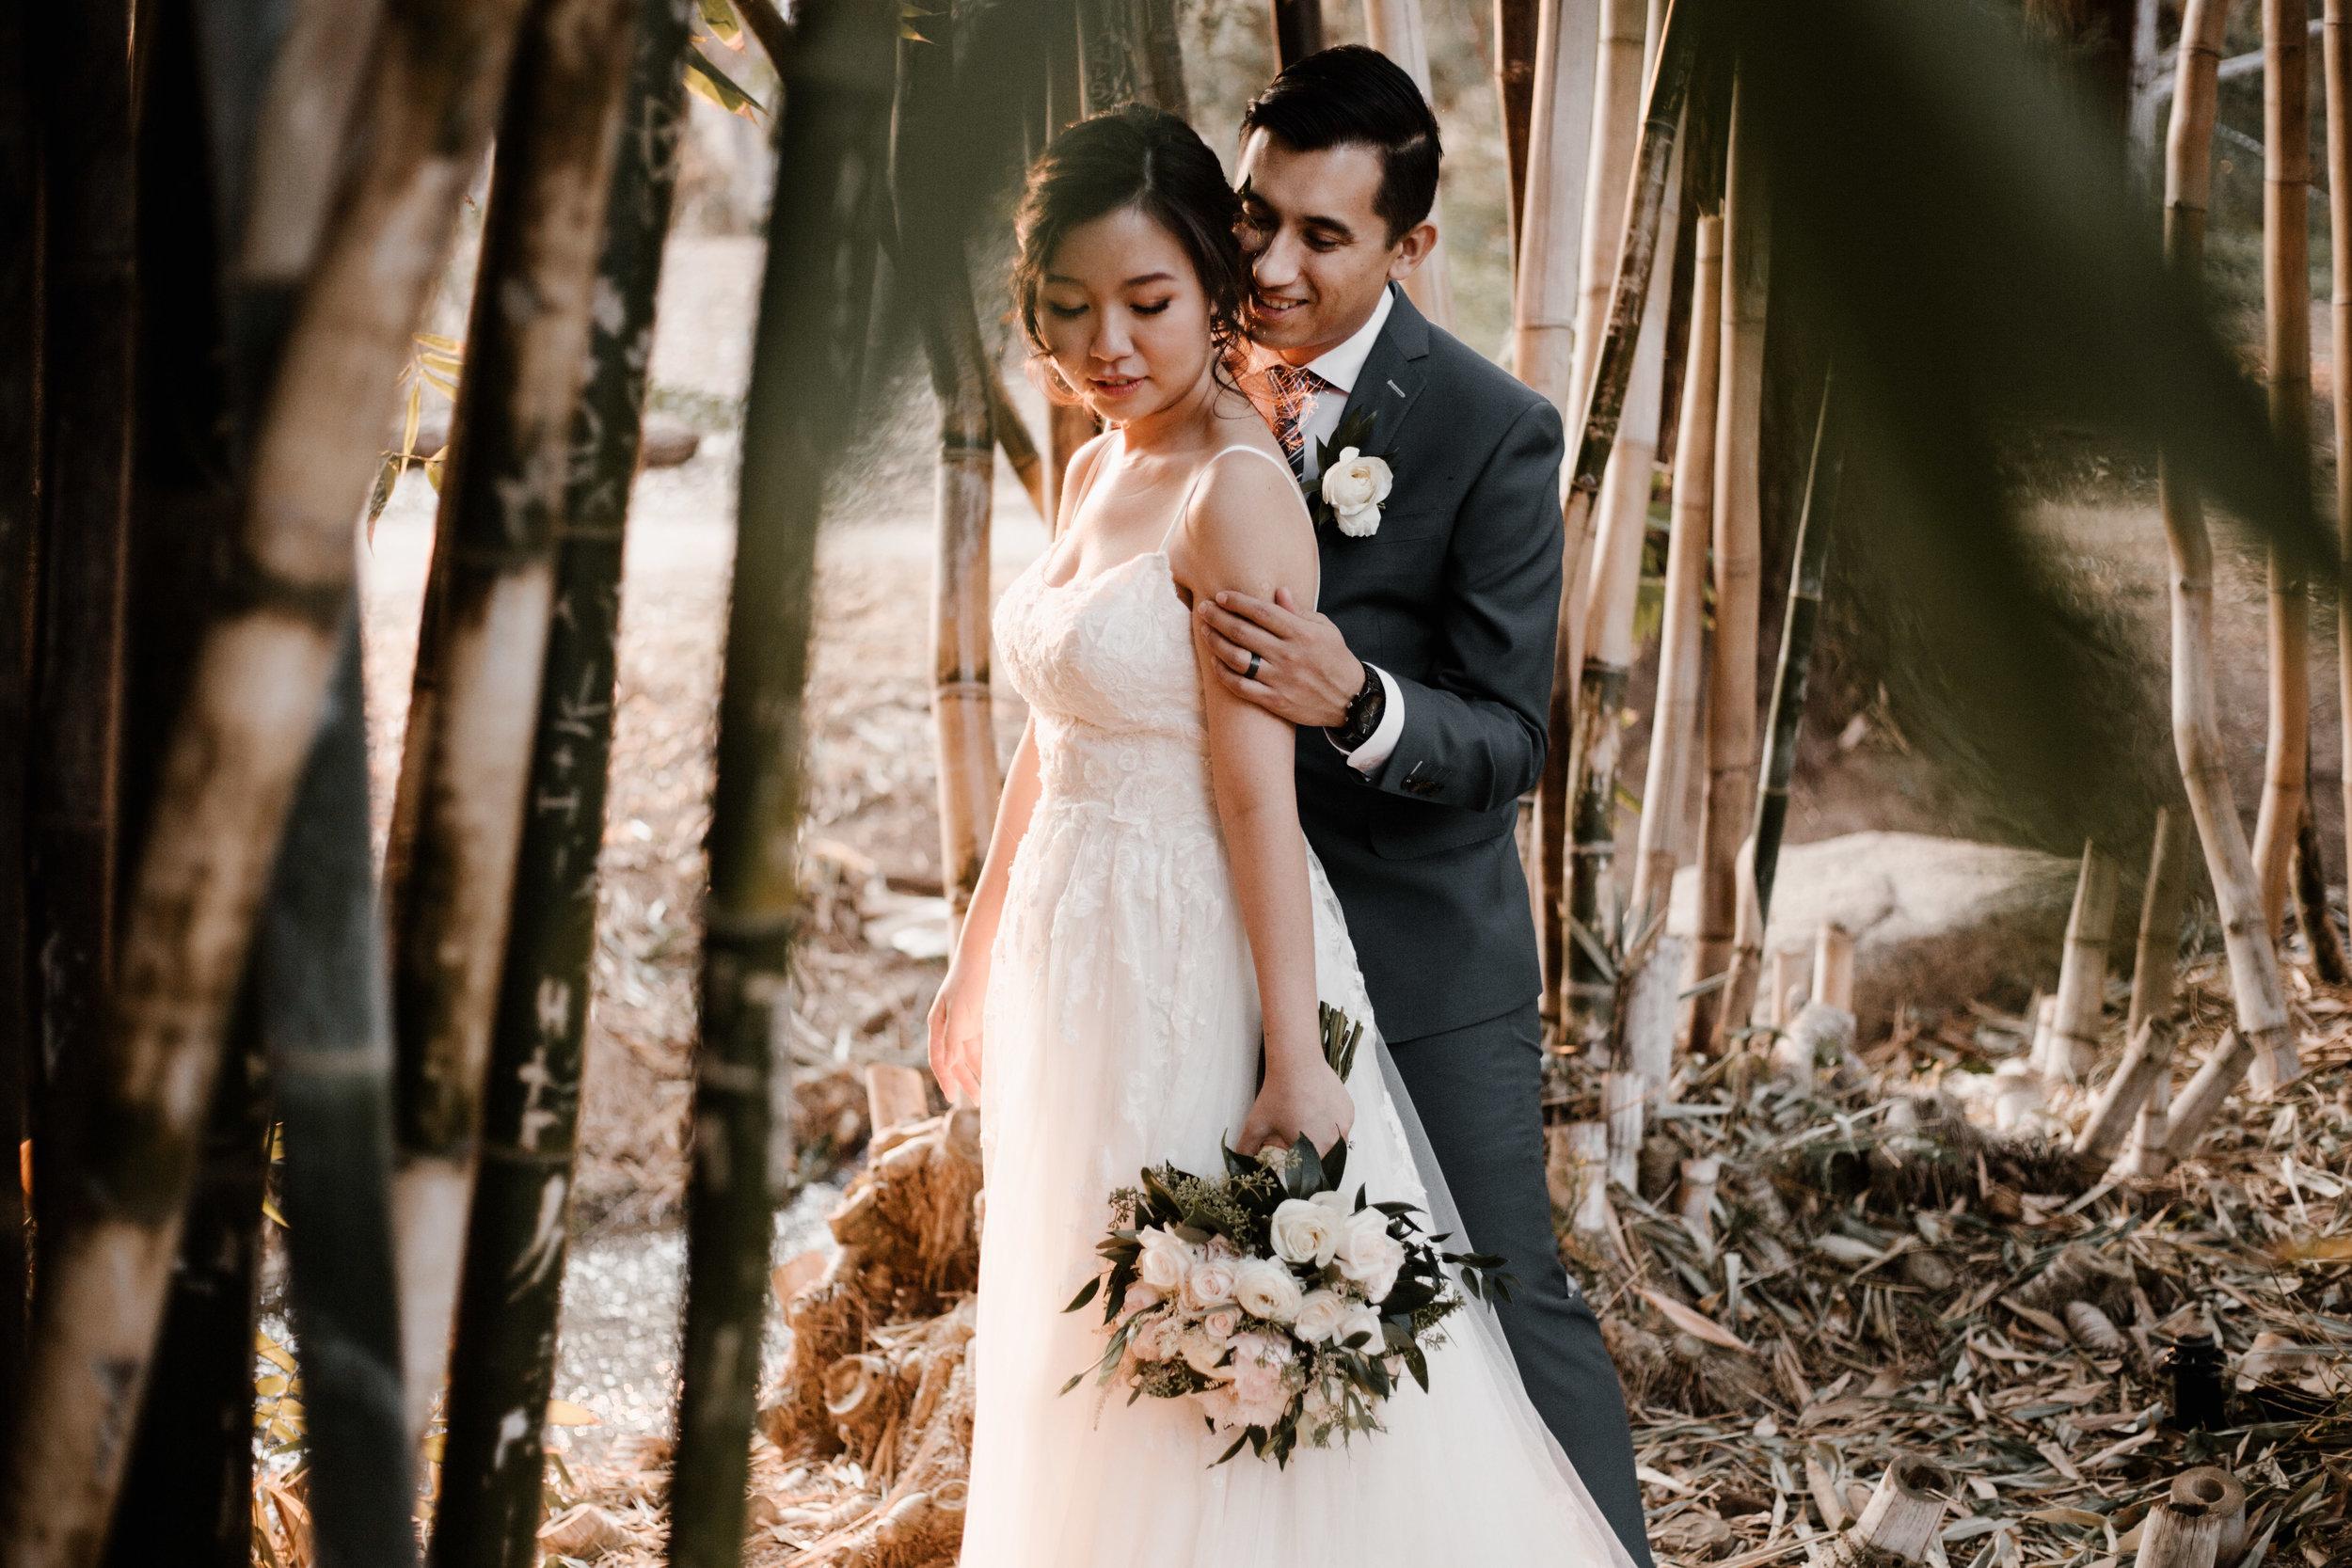 eirene-tommy-wedding-420-khoa-photography.jpg